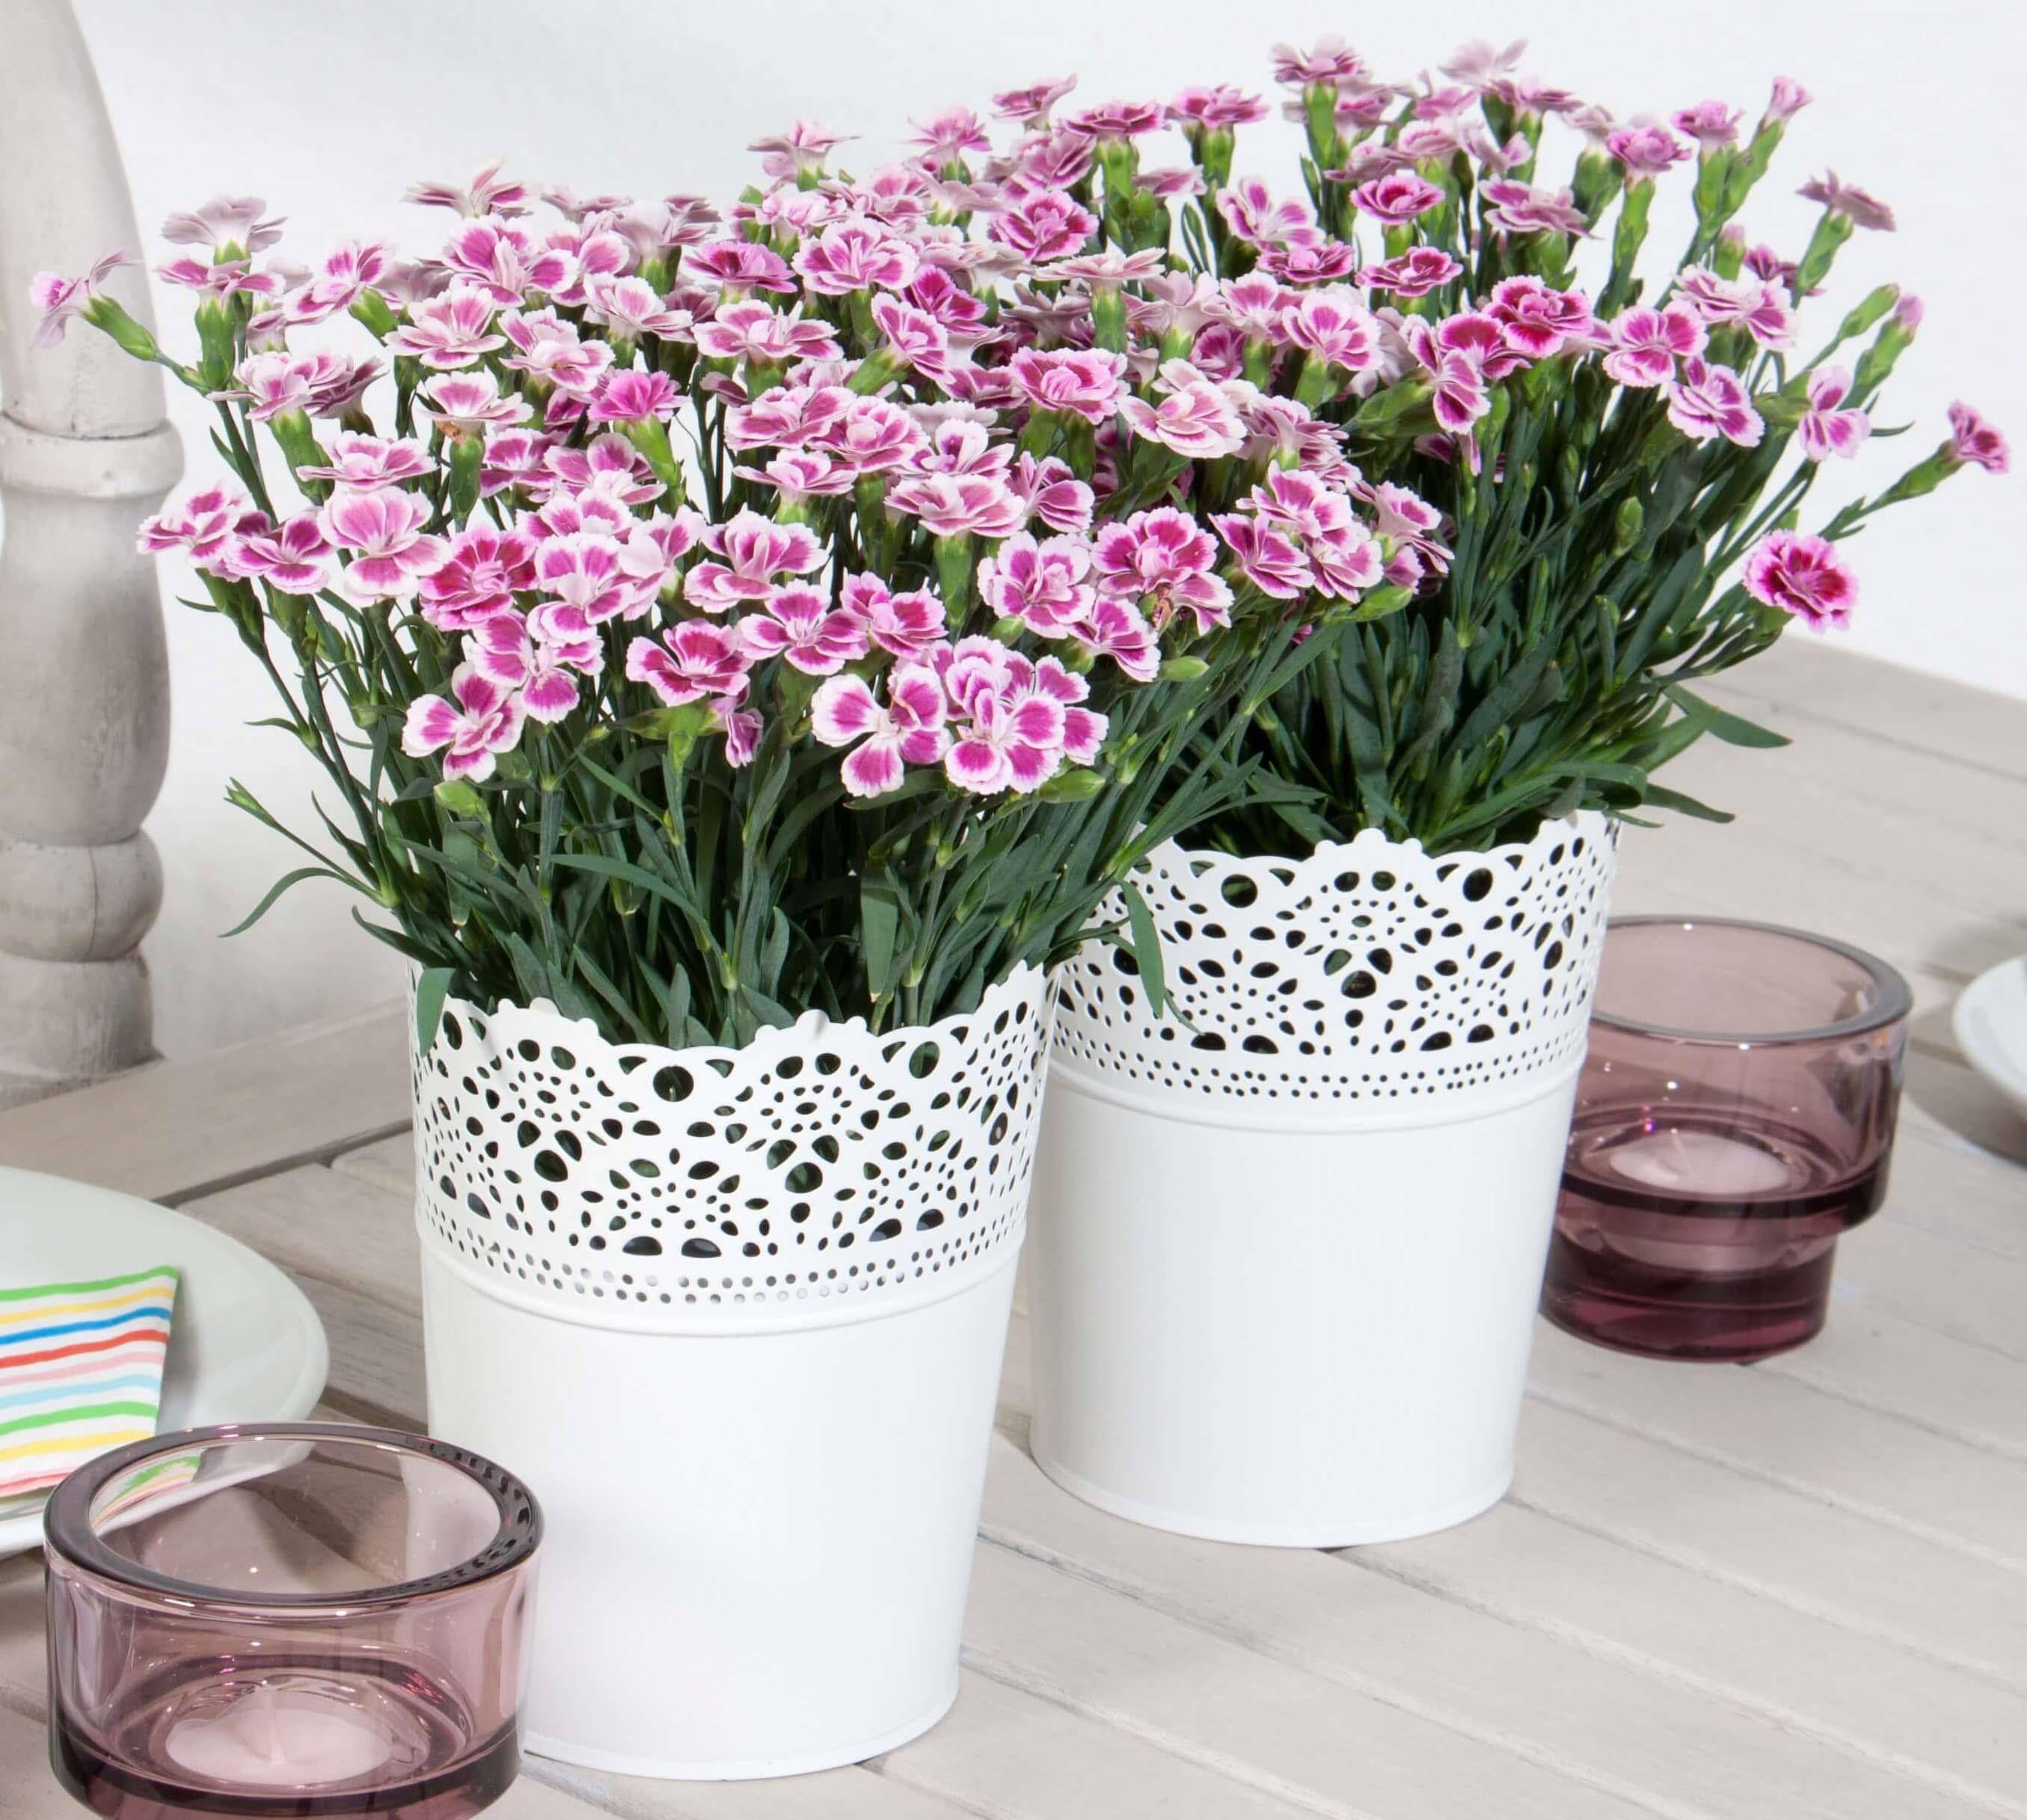 Nelke (Dianthus)  'Pink Kisses®' T12, rosa mit Auge - winterhart